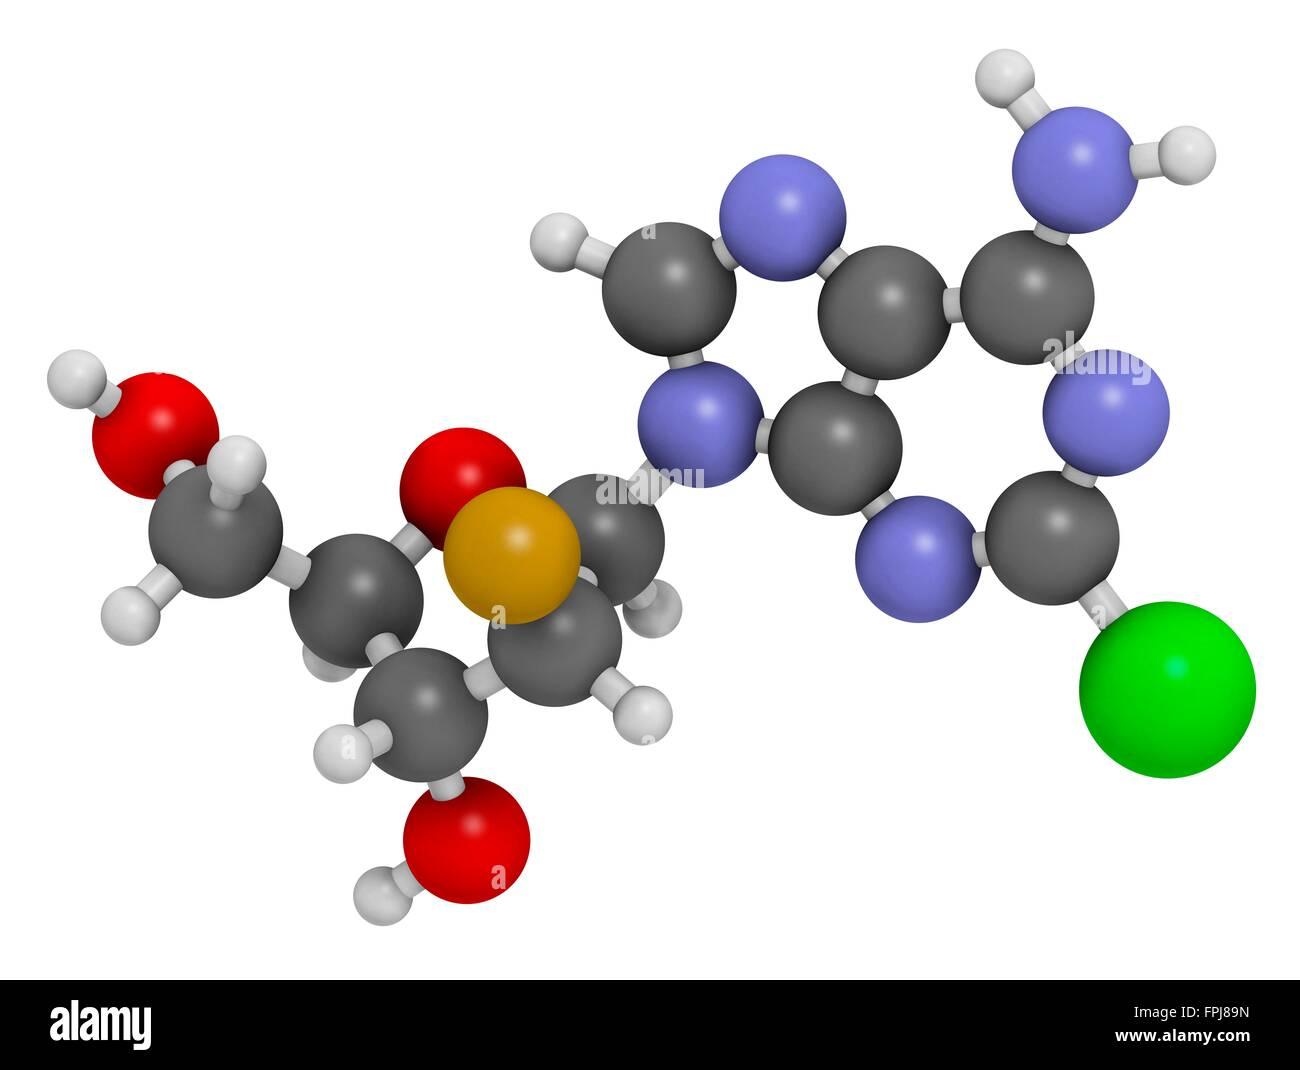 Clofarabine cancer drug molecule (purine nucleoside antimetabolite). Atoms are represented as spheres with c venti - Stock Image